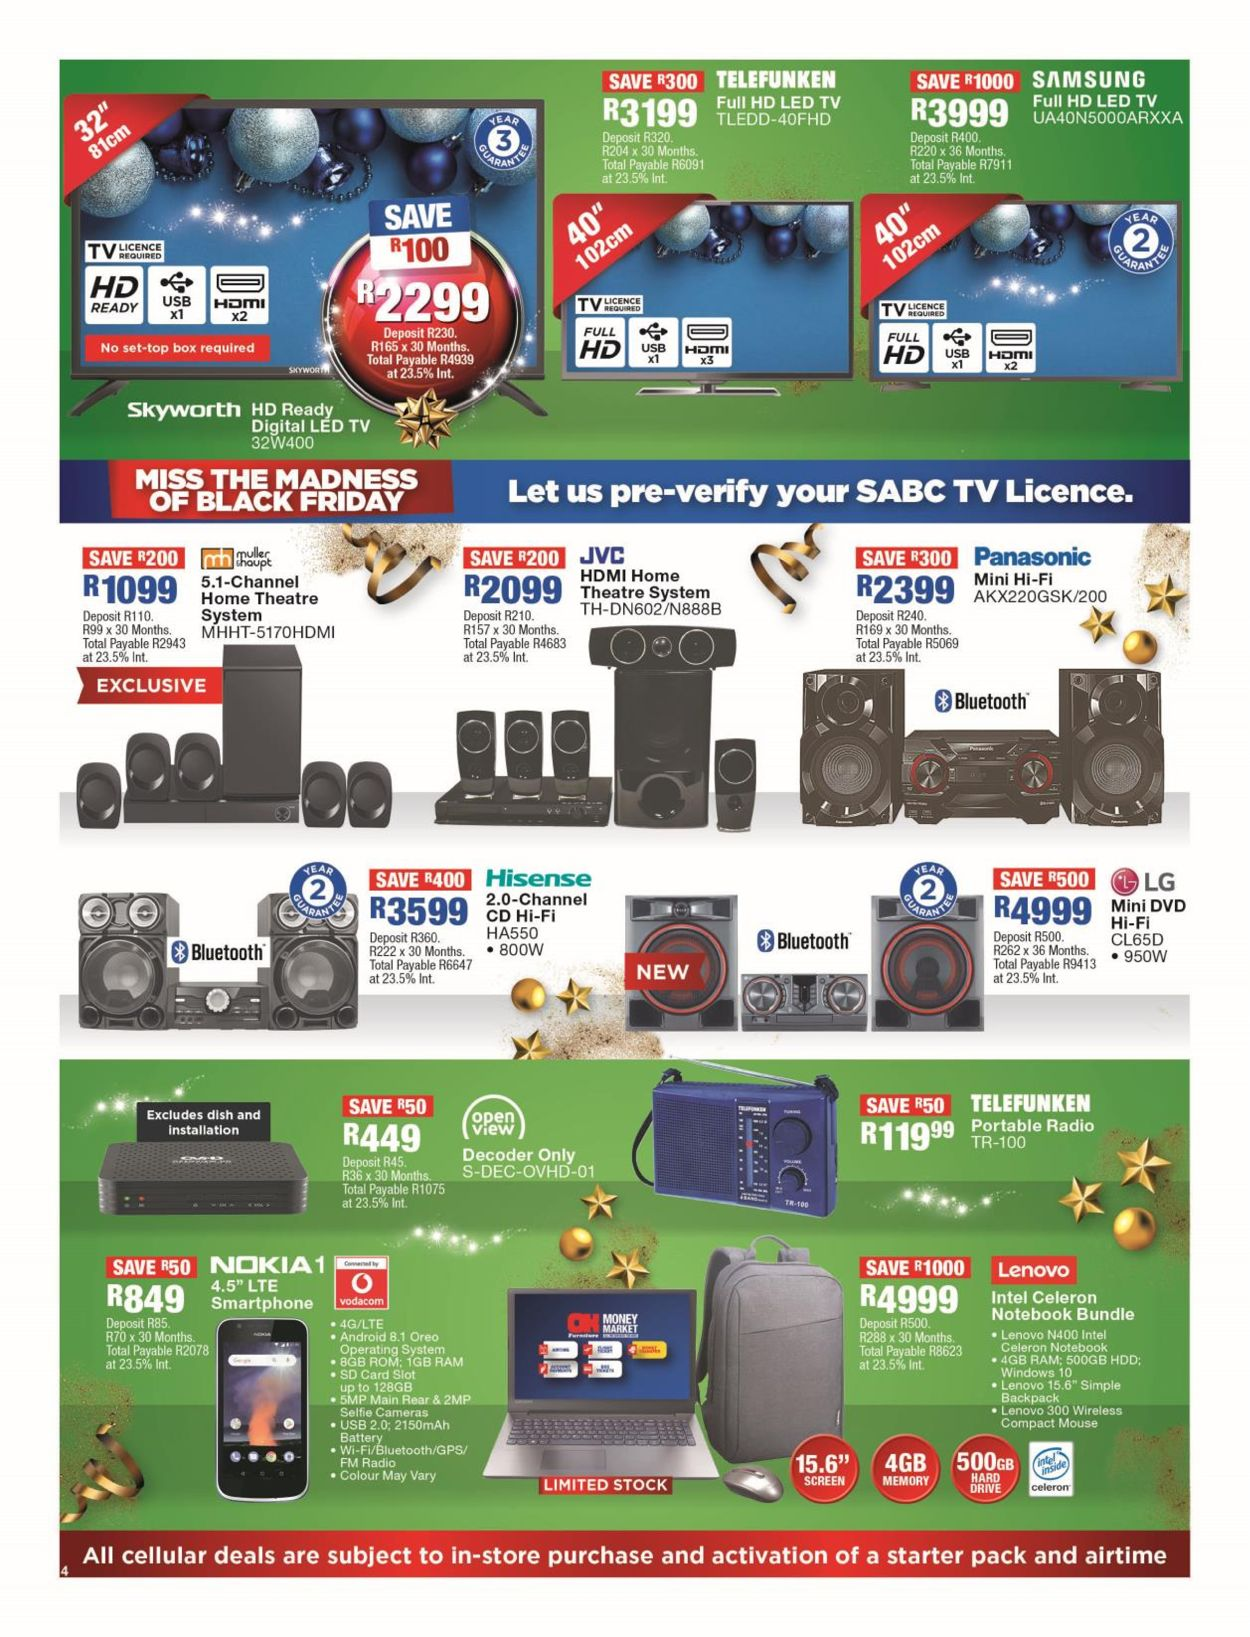 OK Furniture Christmas Catalogue 2019 Catalogue - 2019/11/15-2019/11/24 (Page 4)